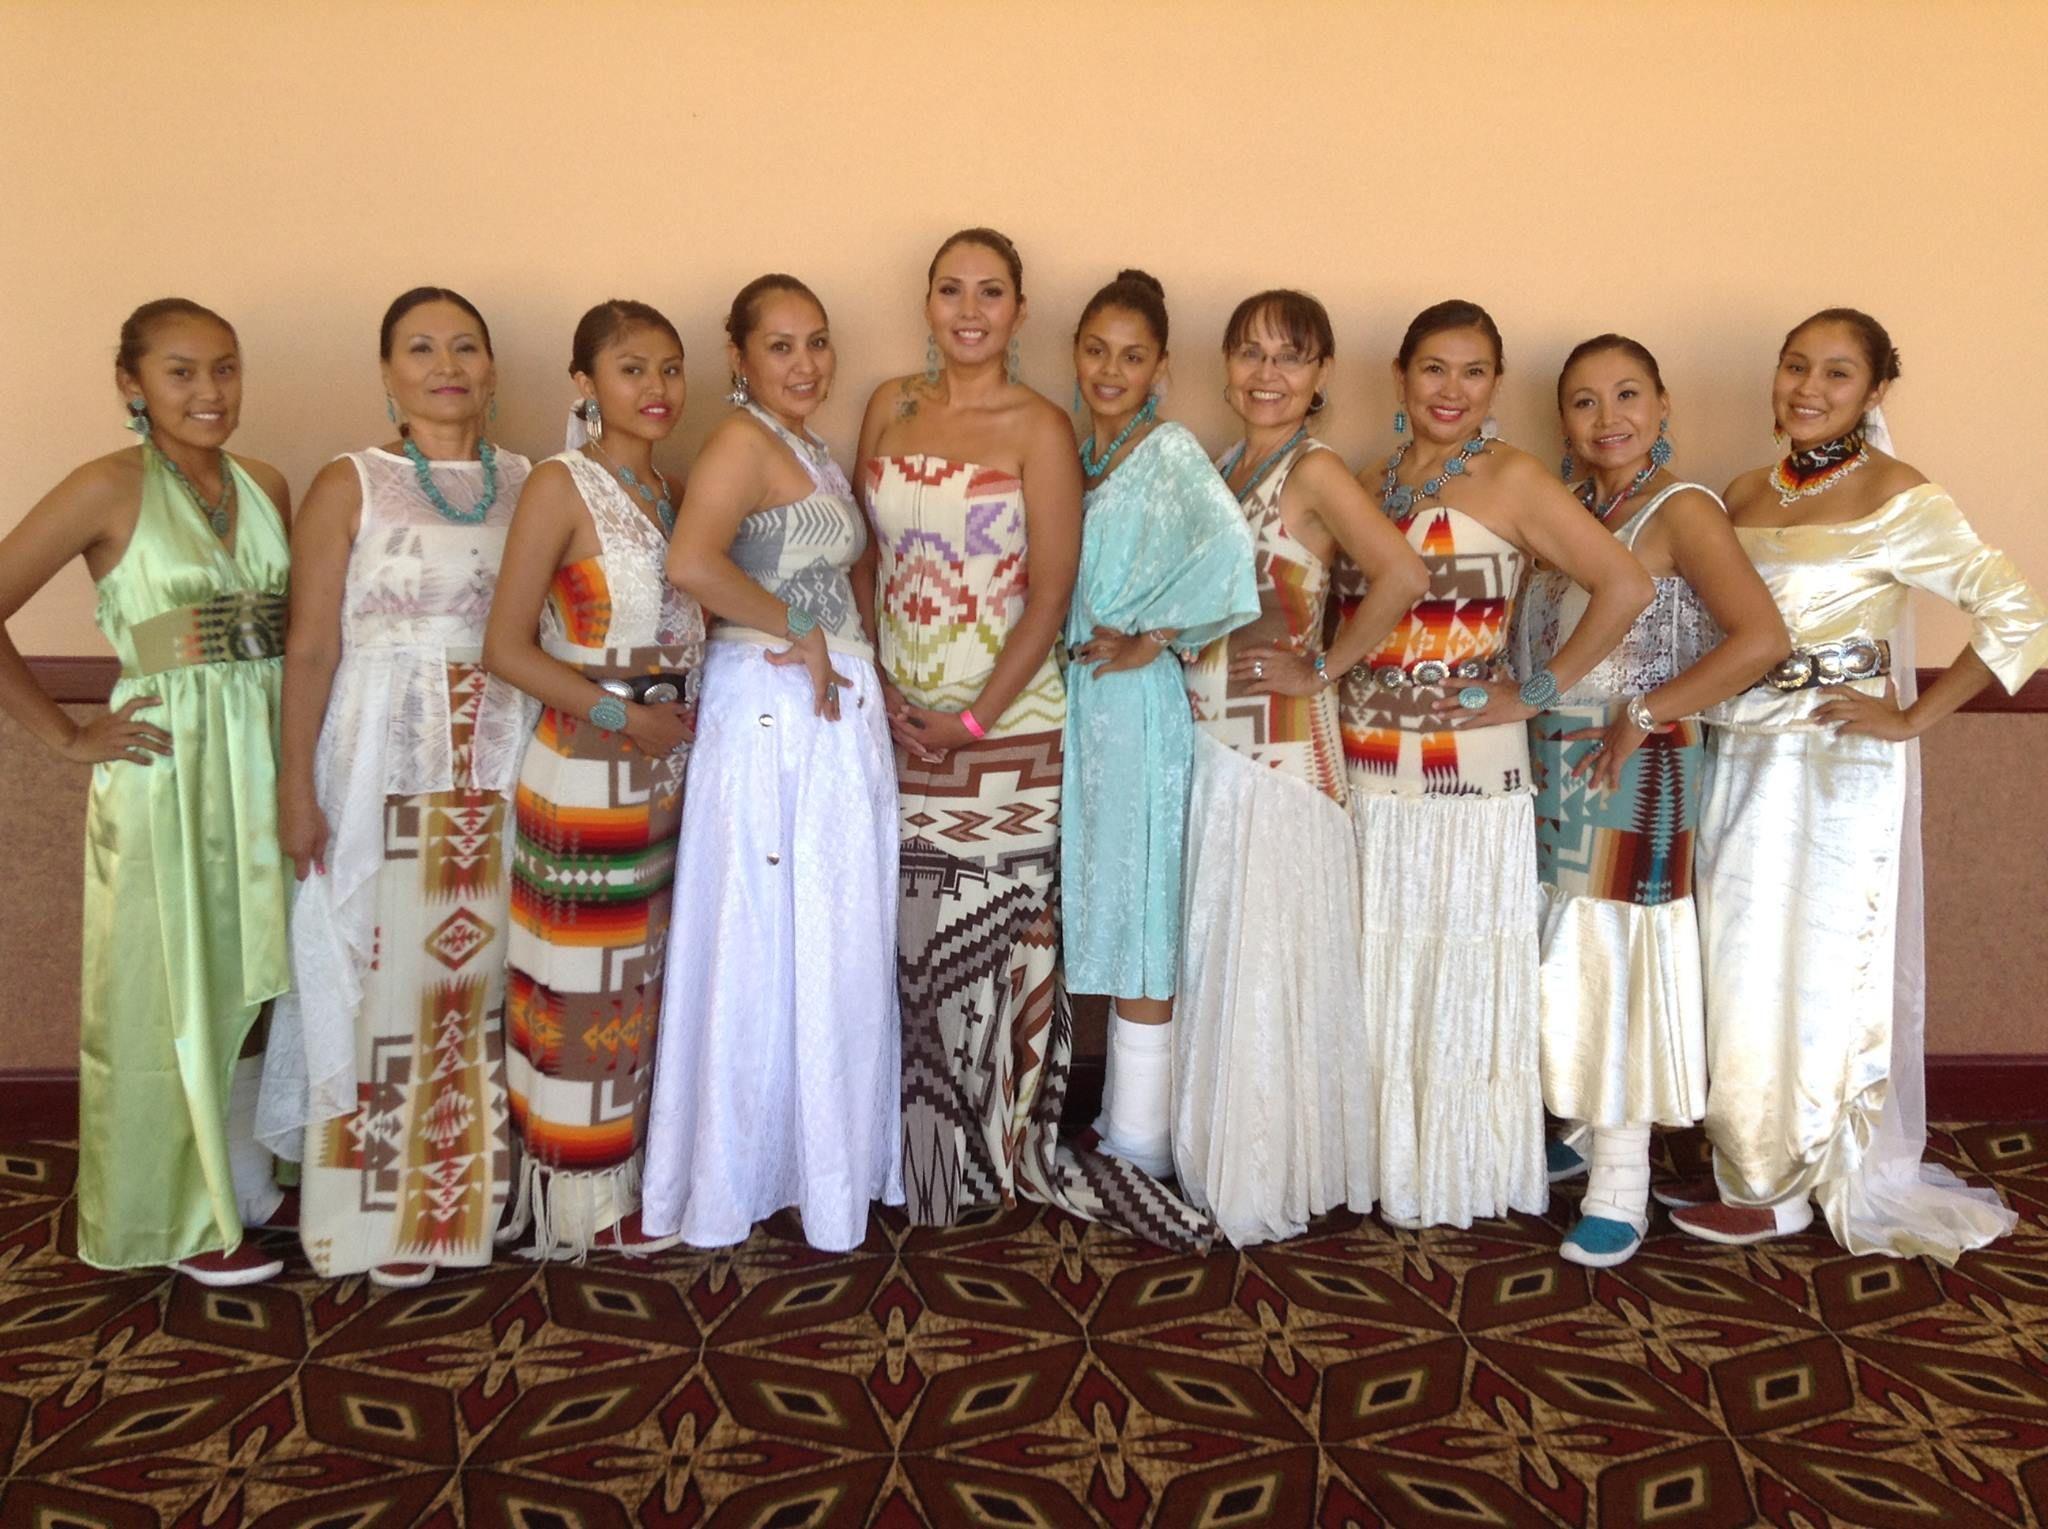 Native american wedding dress  st Annual Bridal Expo at Hon Dah Apache Casino Fashion Show